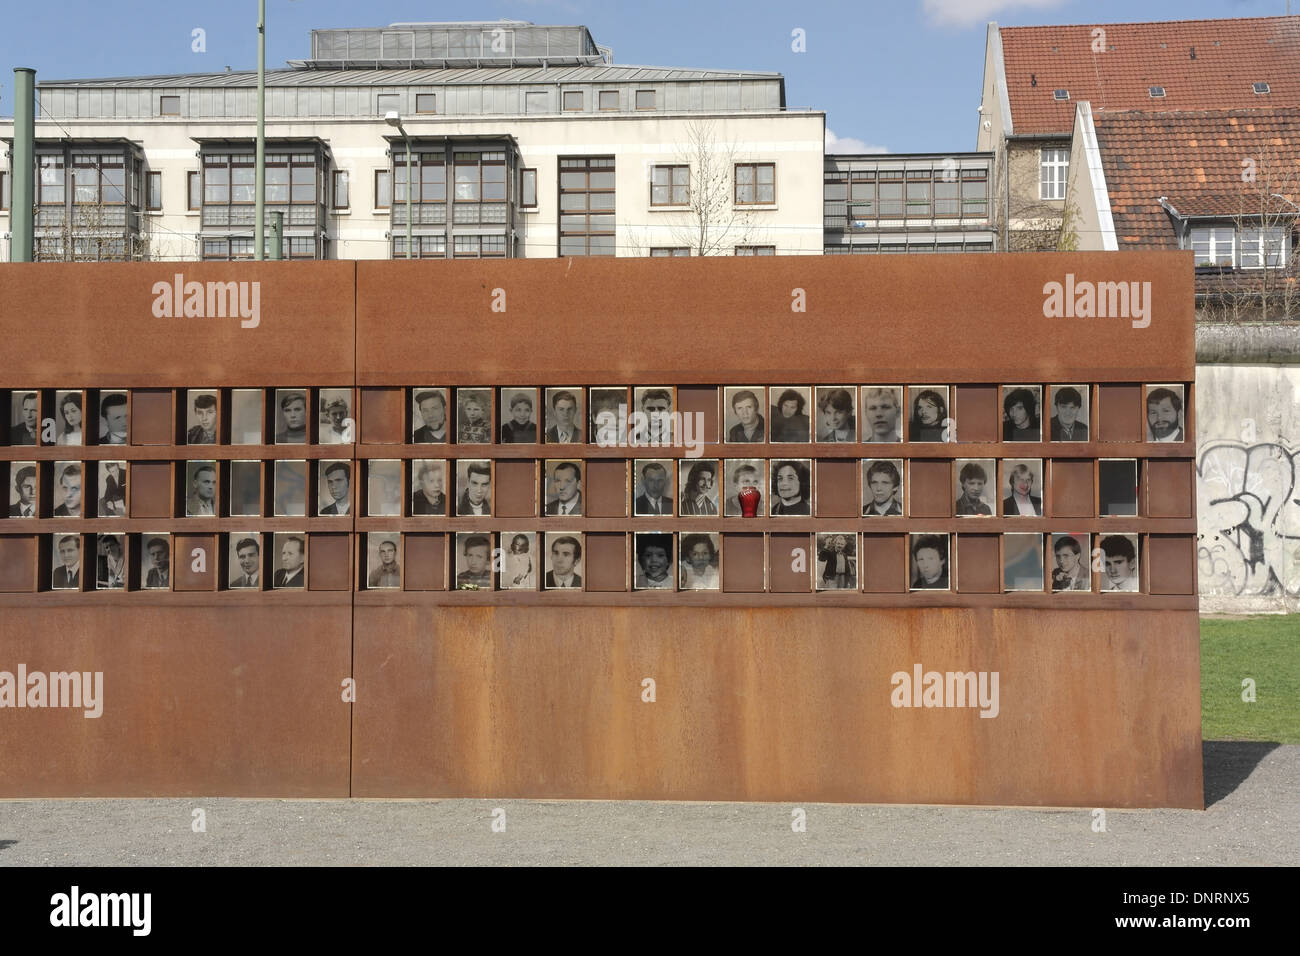 urban dating wall